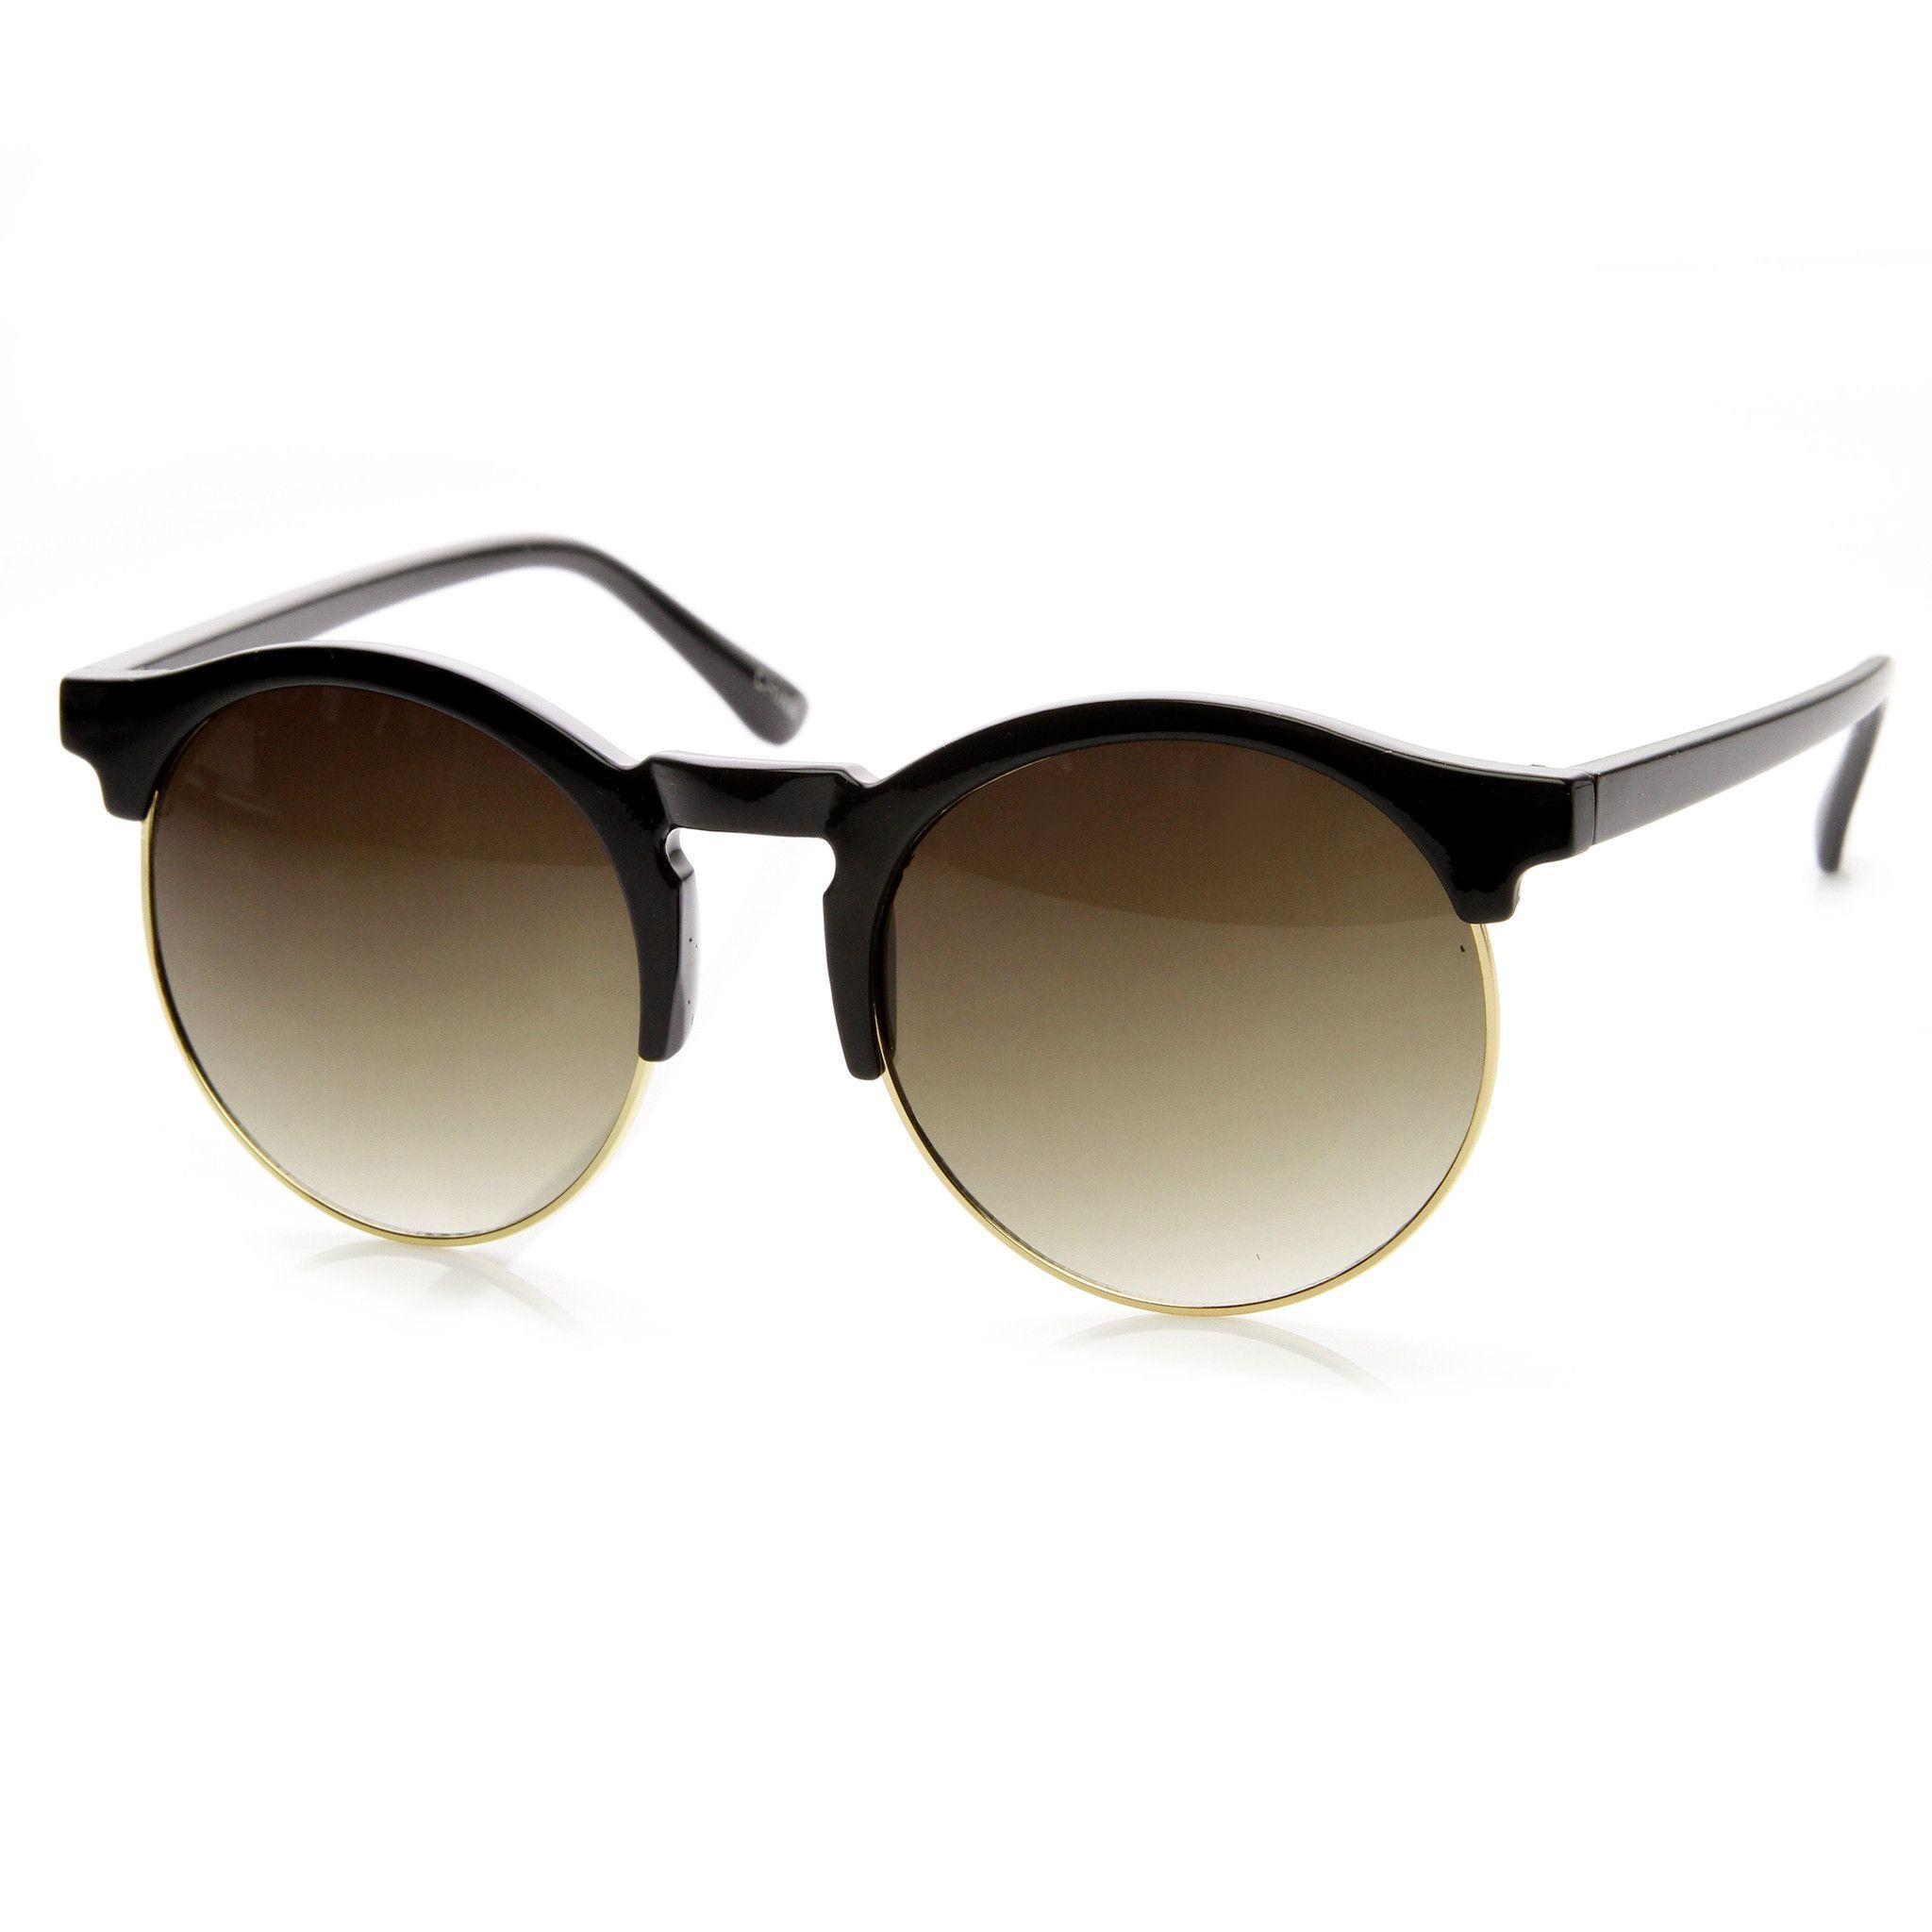 1e2ace6763 Oversize Retro Round Indie Half Frame Sunglasses 9173